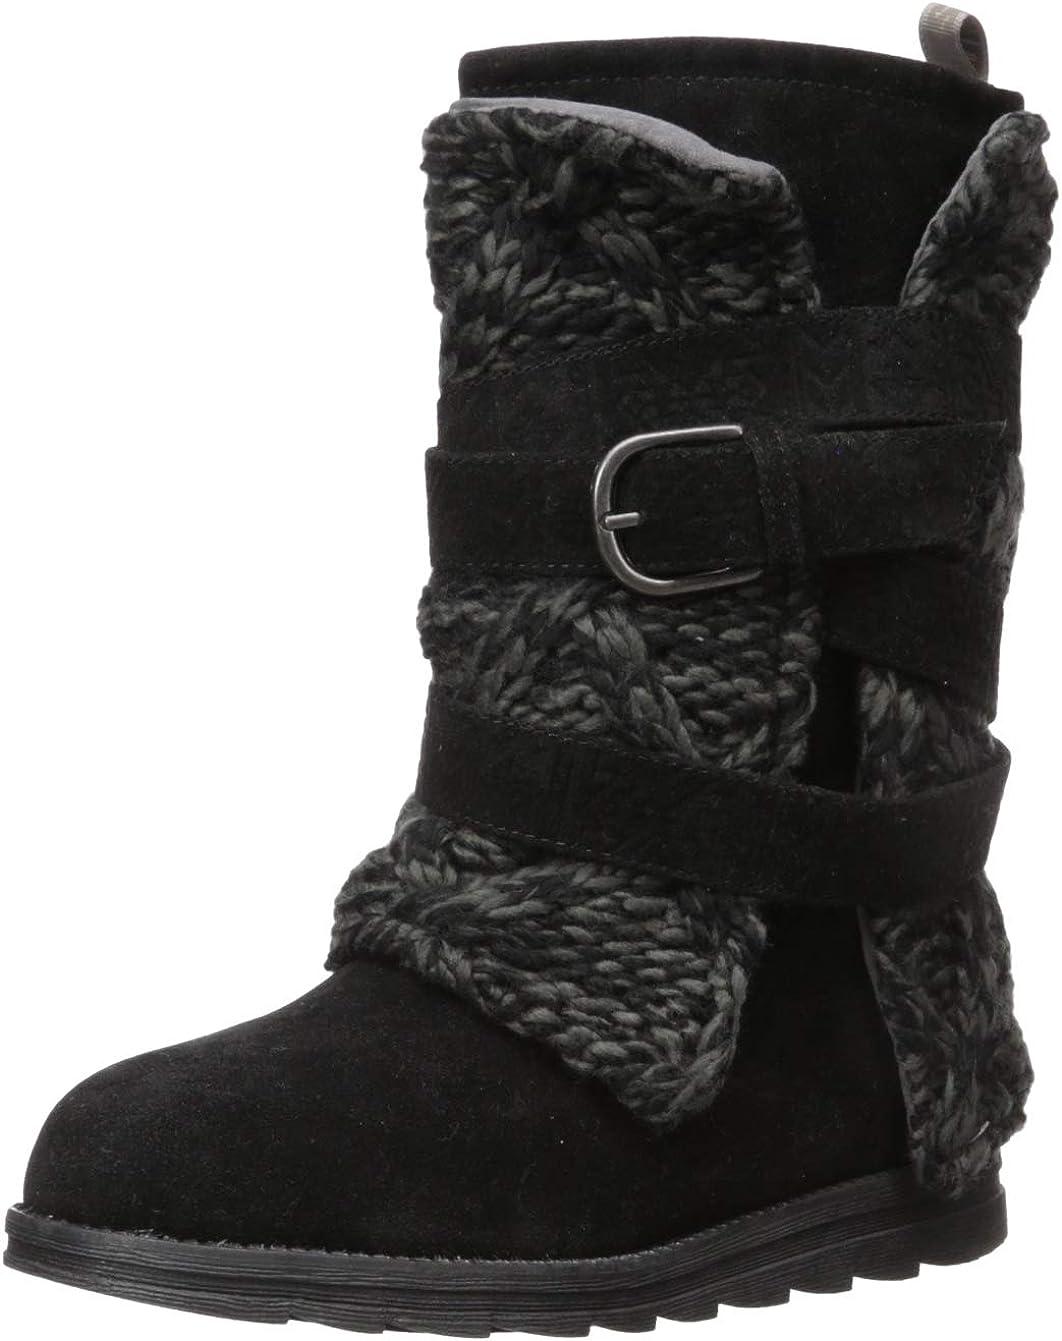 | MUK LUKS Women's Nikki Boots Mid Calf | Mid-Calf